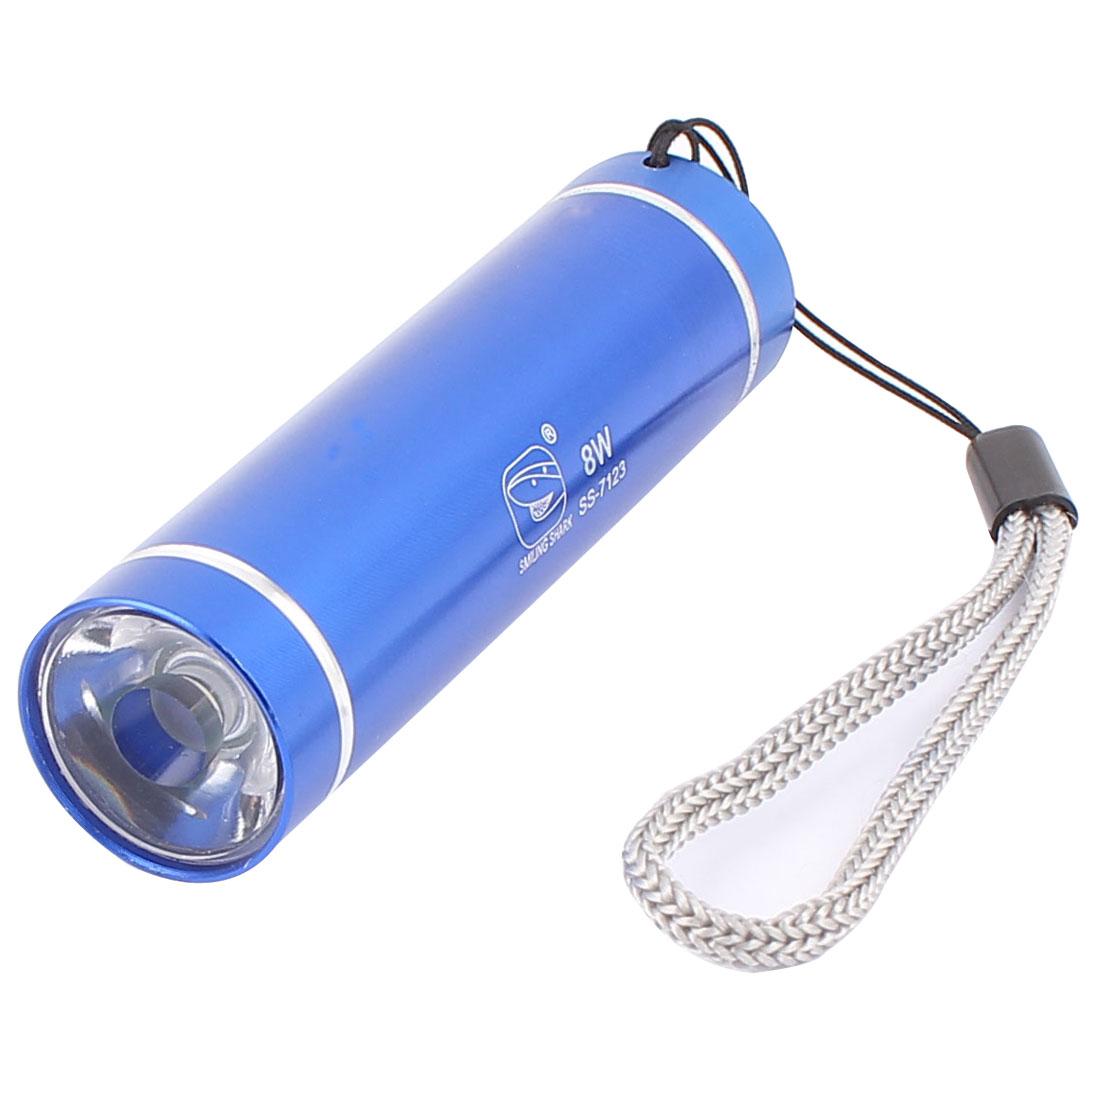 Aluminium Alloy Shell 1-LED White Light Flashlight Torch Lamp Blue